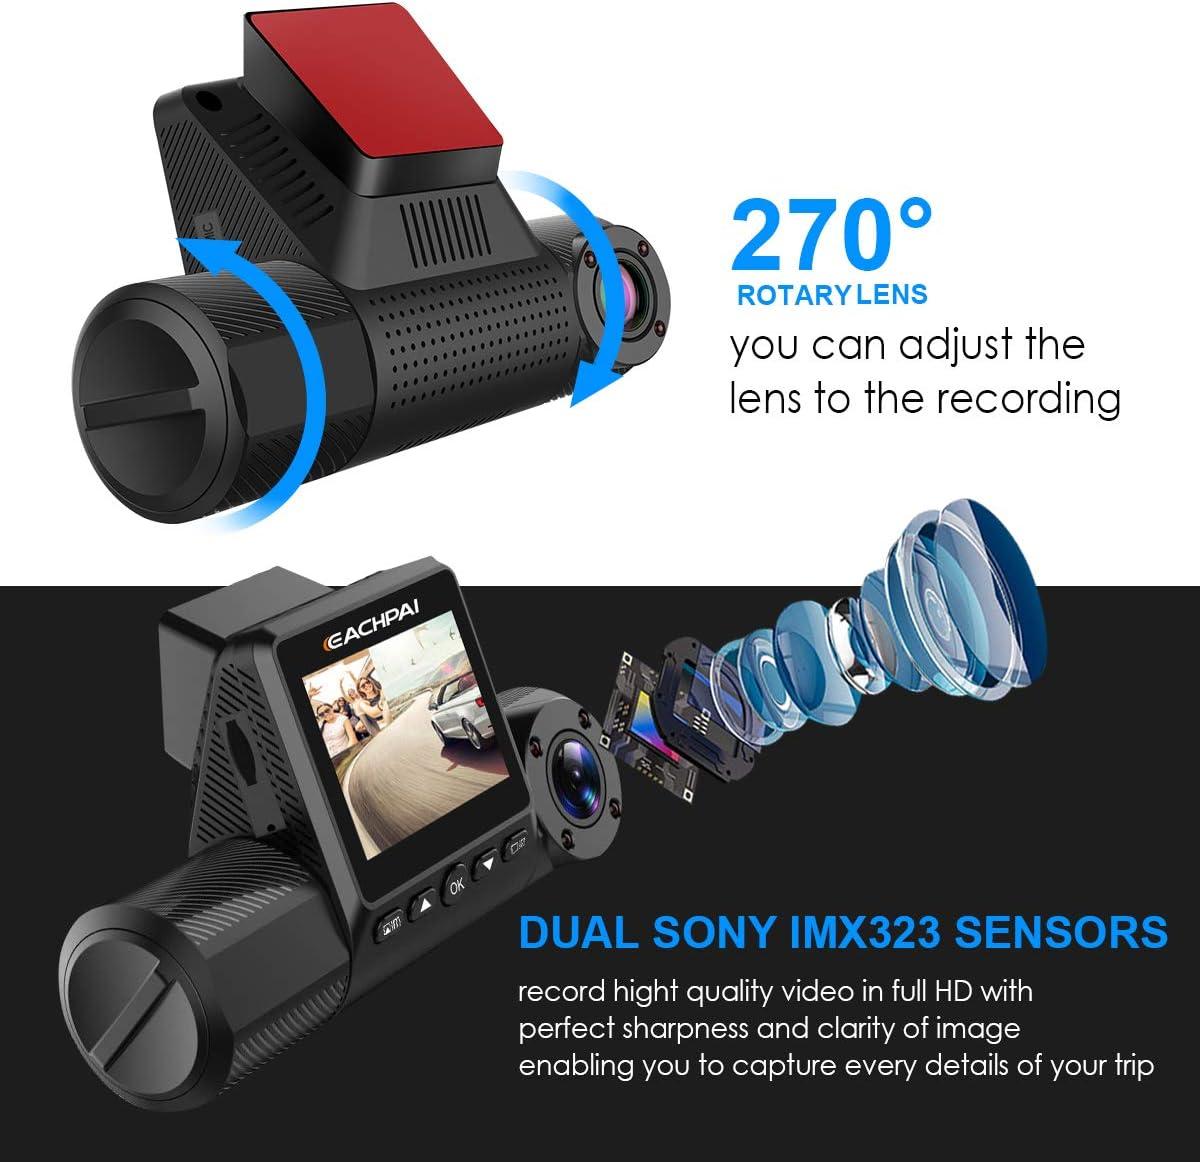 Loop Recording IR Night Vision Motion Detection,Super Capacitor EACHPAI X200 Dash Camera for Cars 2 FHD 1080P Dashboard Camera 270/° Rotation with Sony Sensor Dual Dash Cam